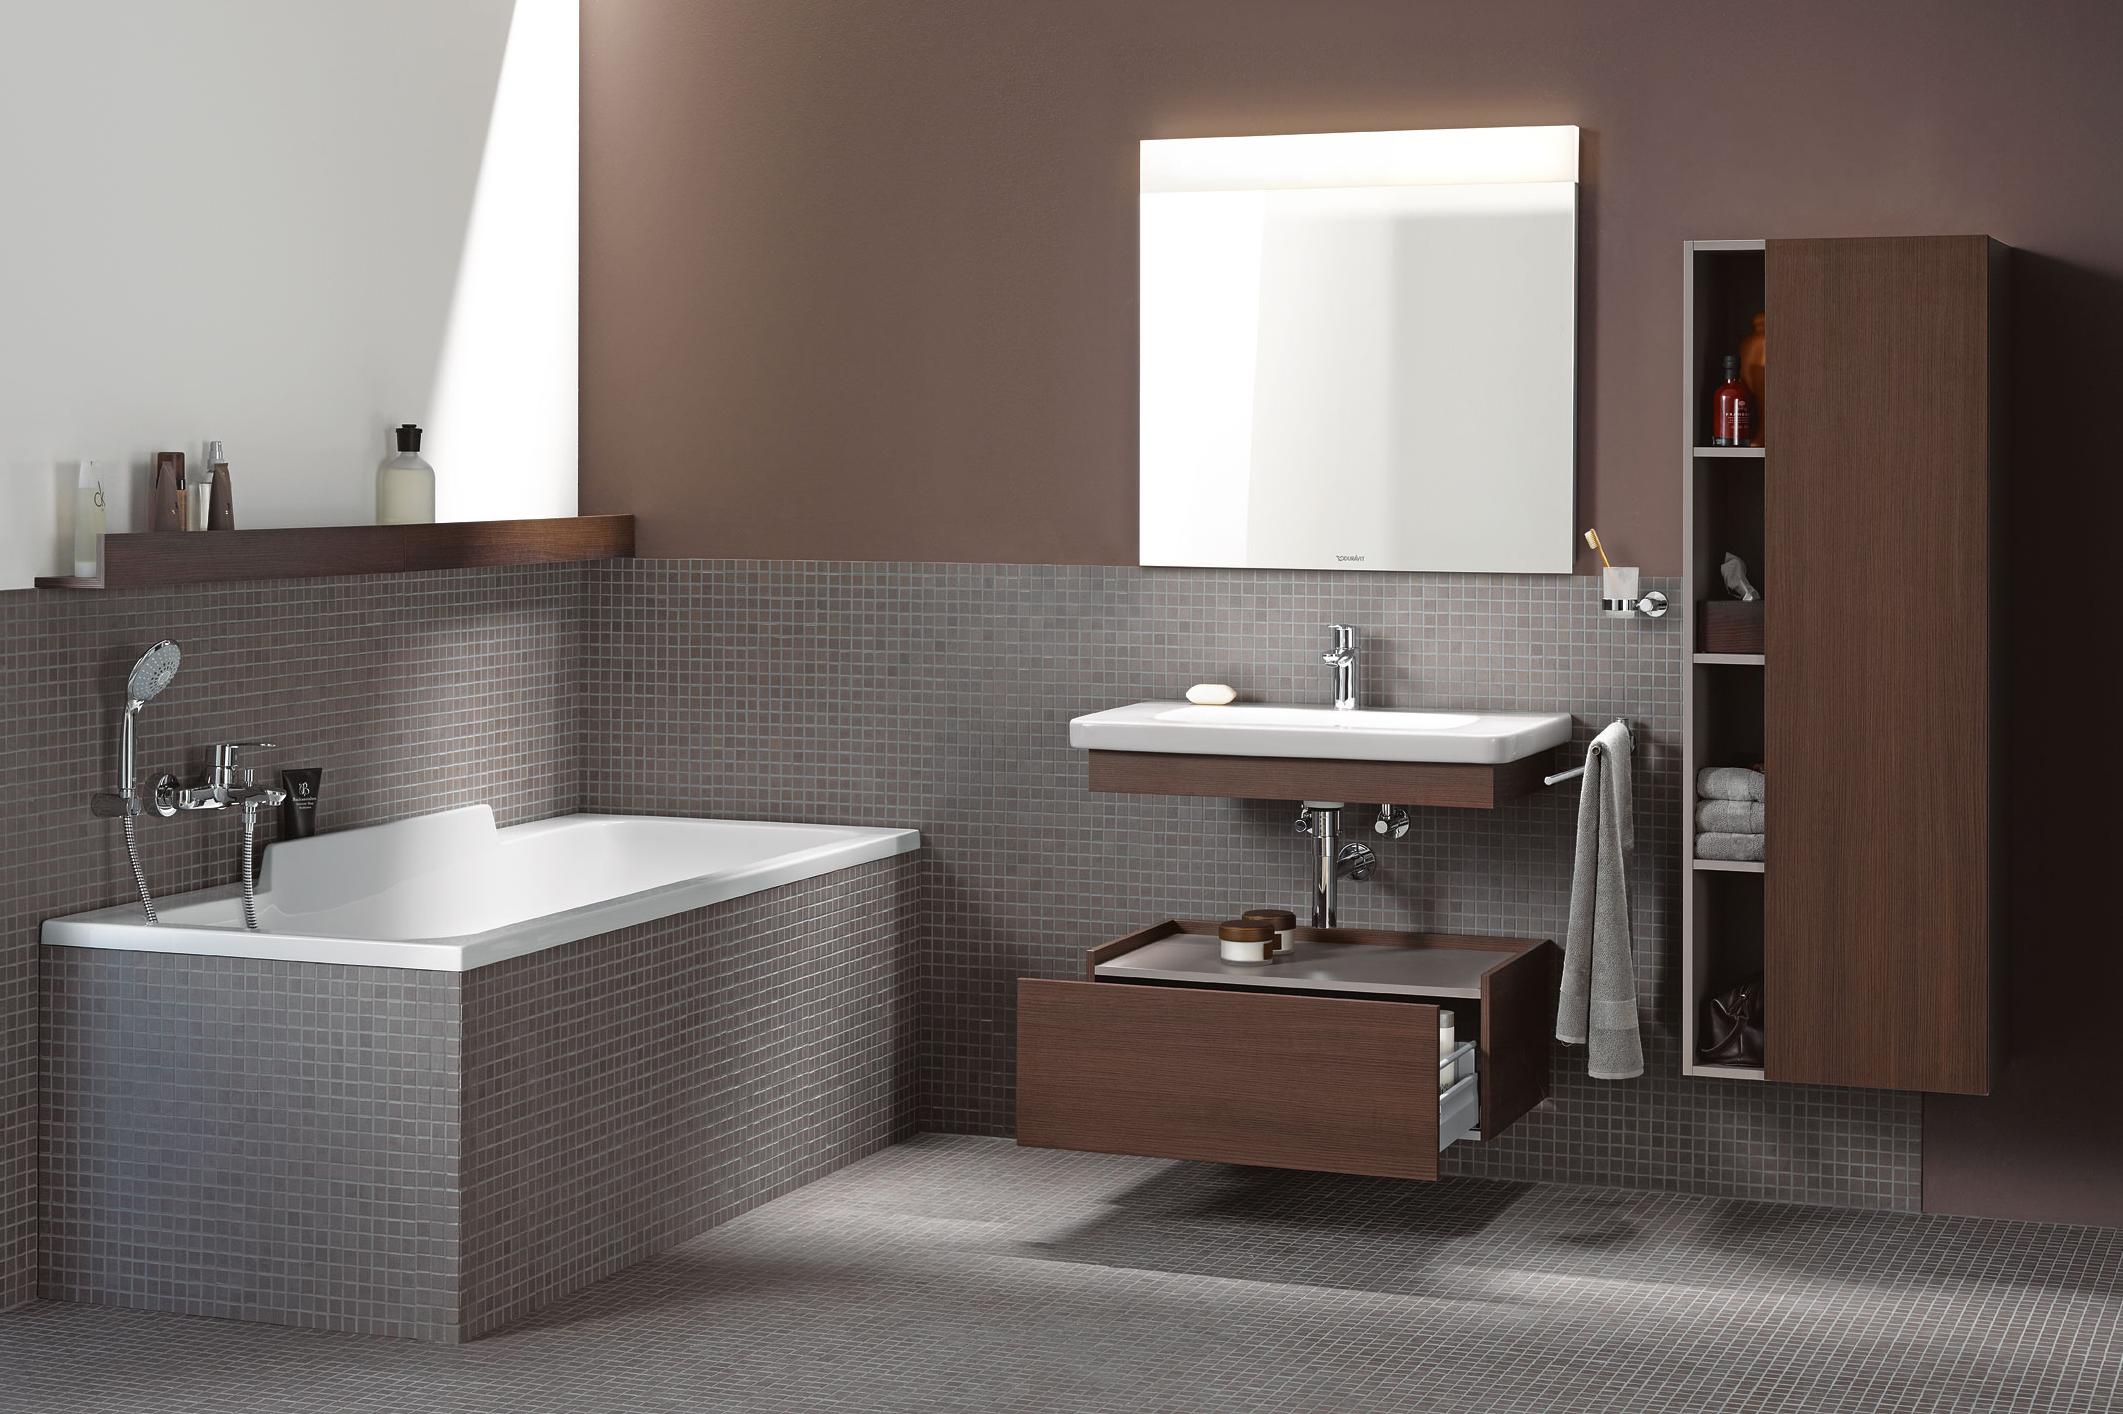 DuraStyle Toilet wall-mounted #253709 | Duravit